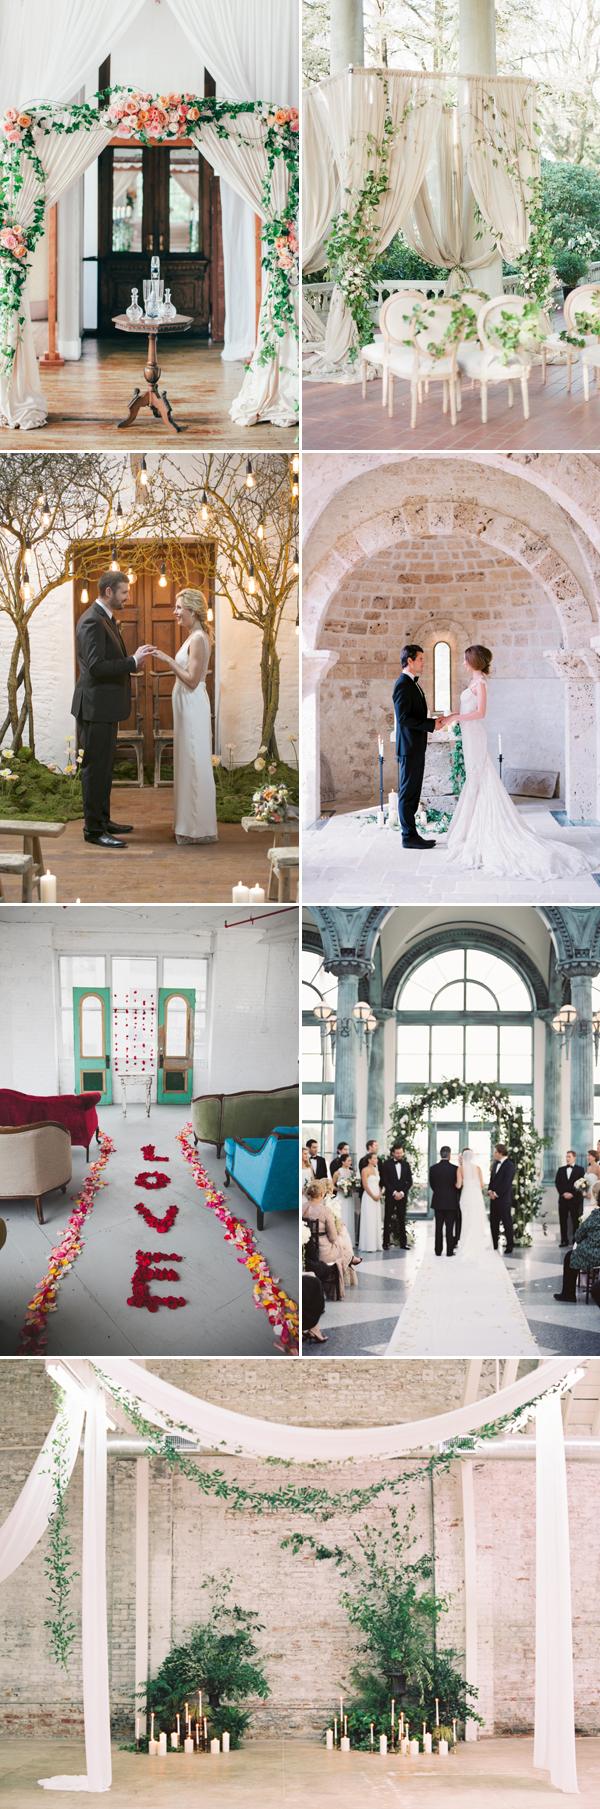 weddingdecor01-intimate